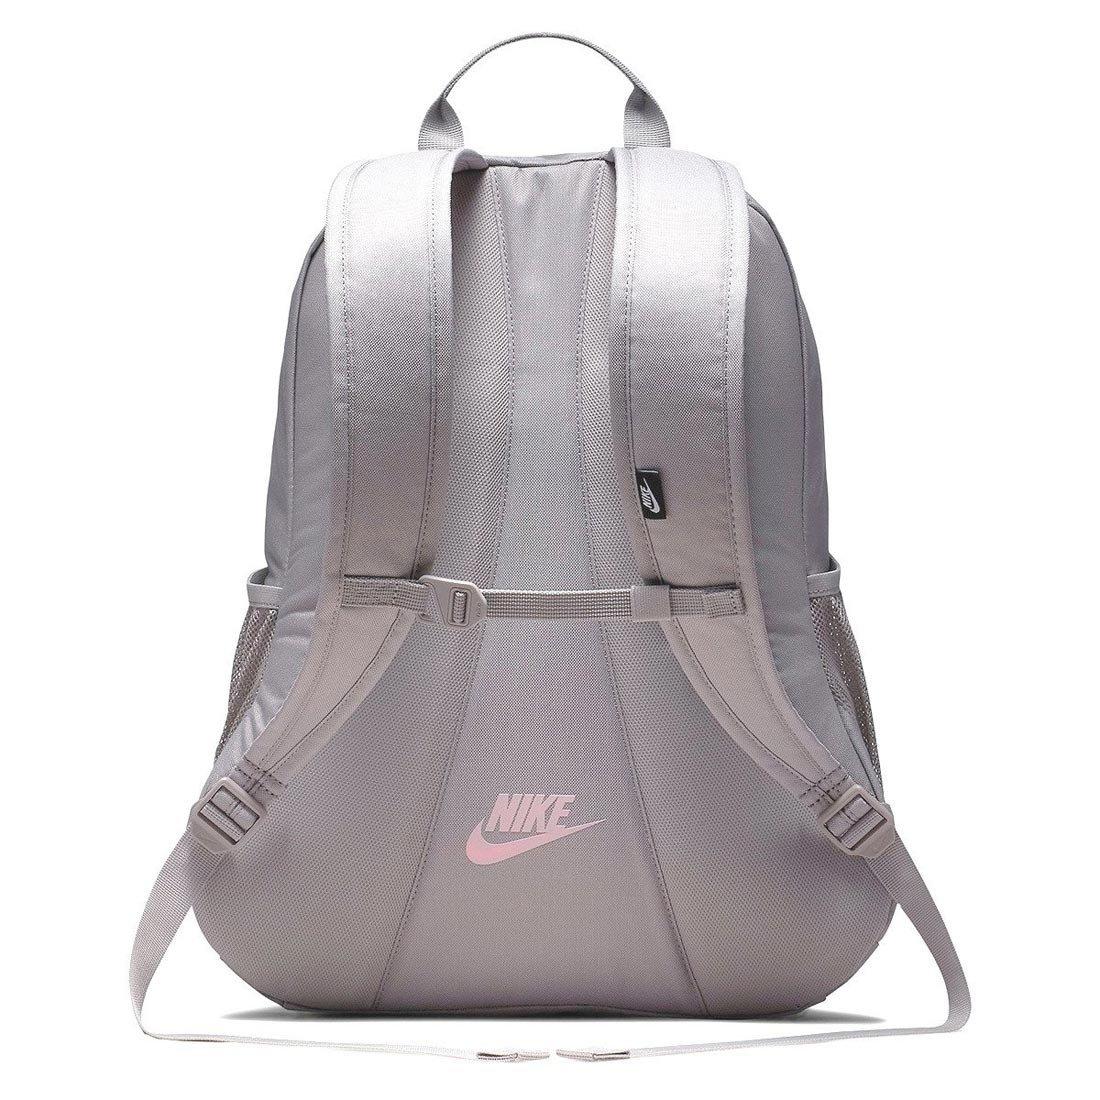 2e7c7de519769 ... Plecak Nike Hayward Futura 2.0 BA5217-027 Kliknij, aby powiększyć ...